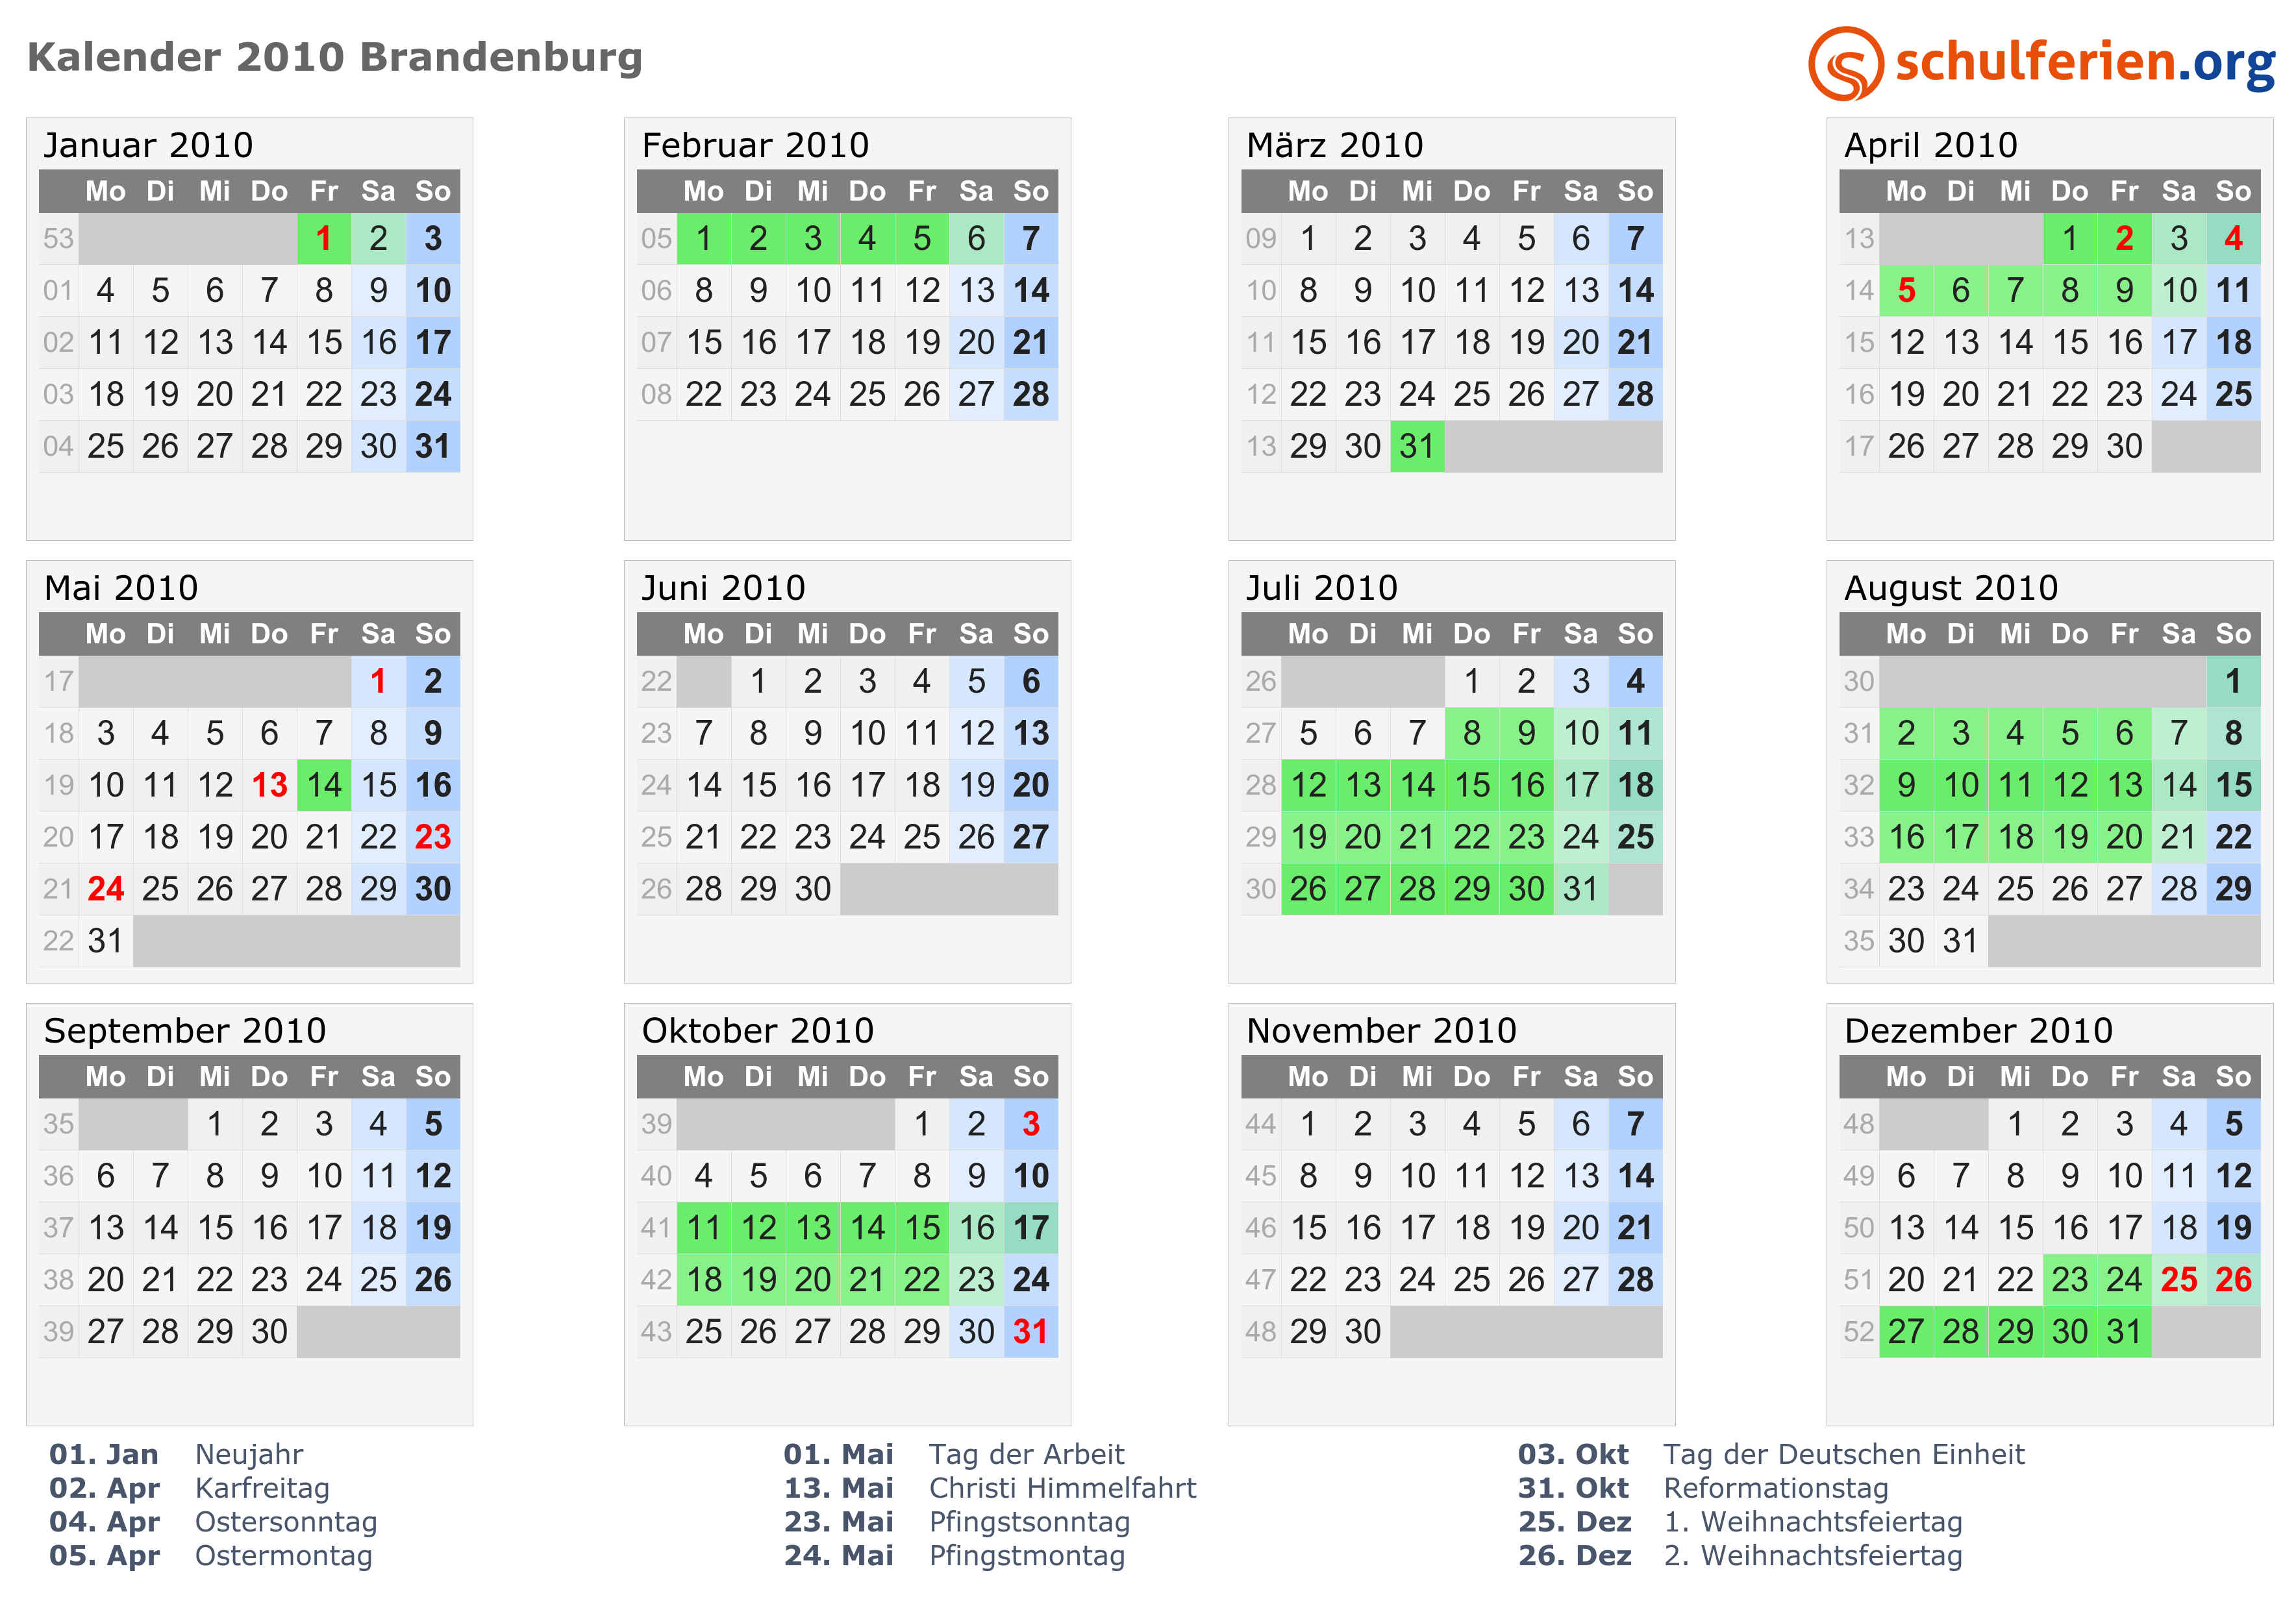 31.10 Feiertag Brandenburg